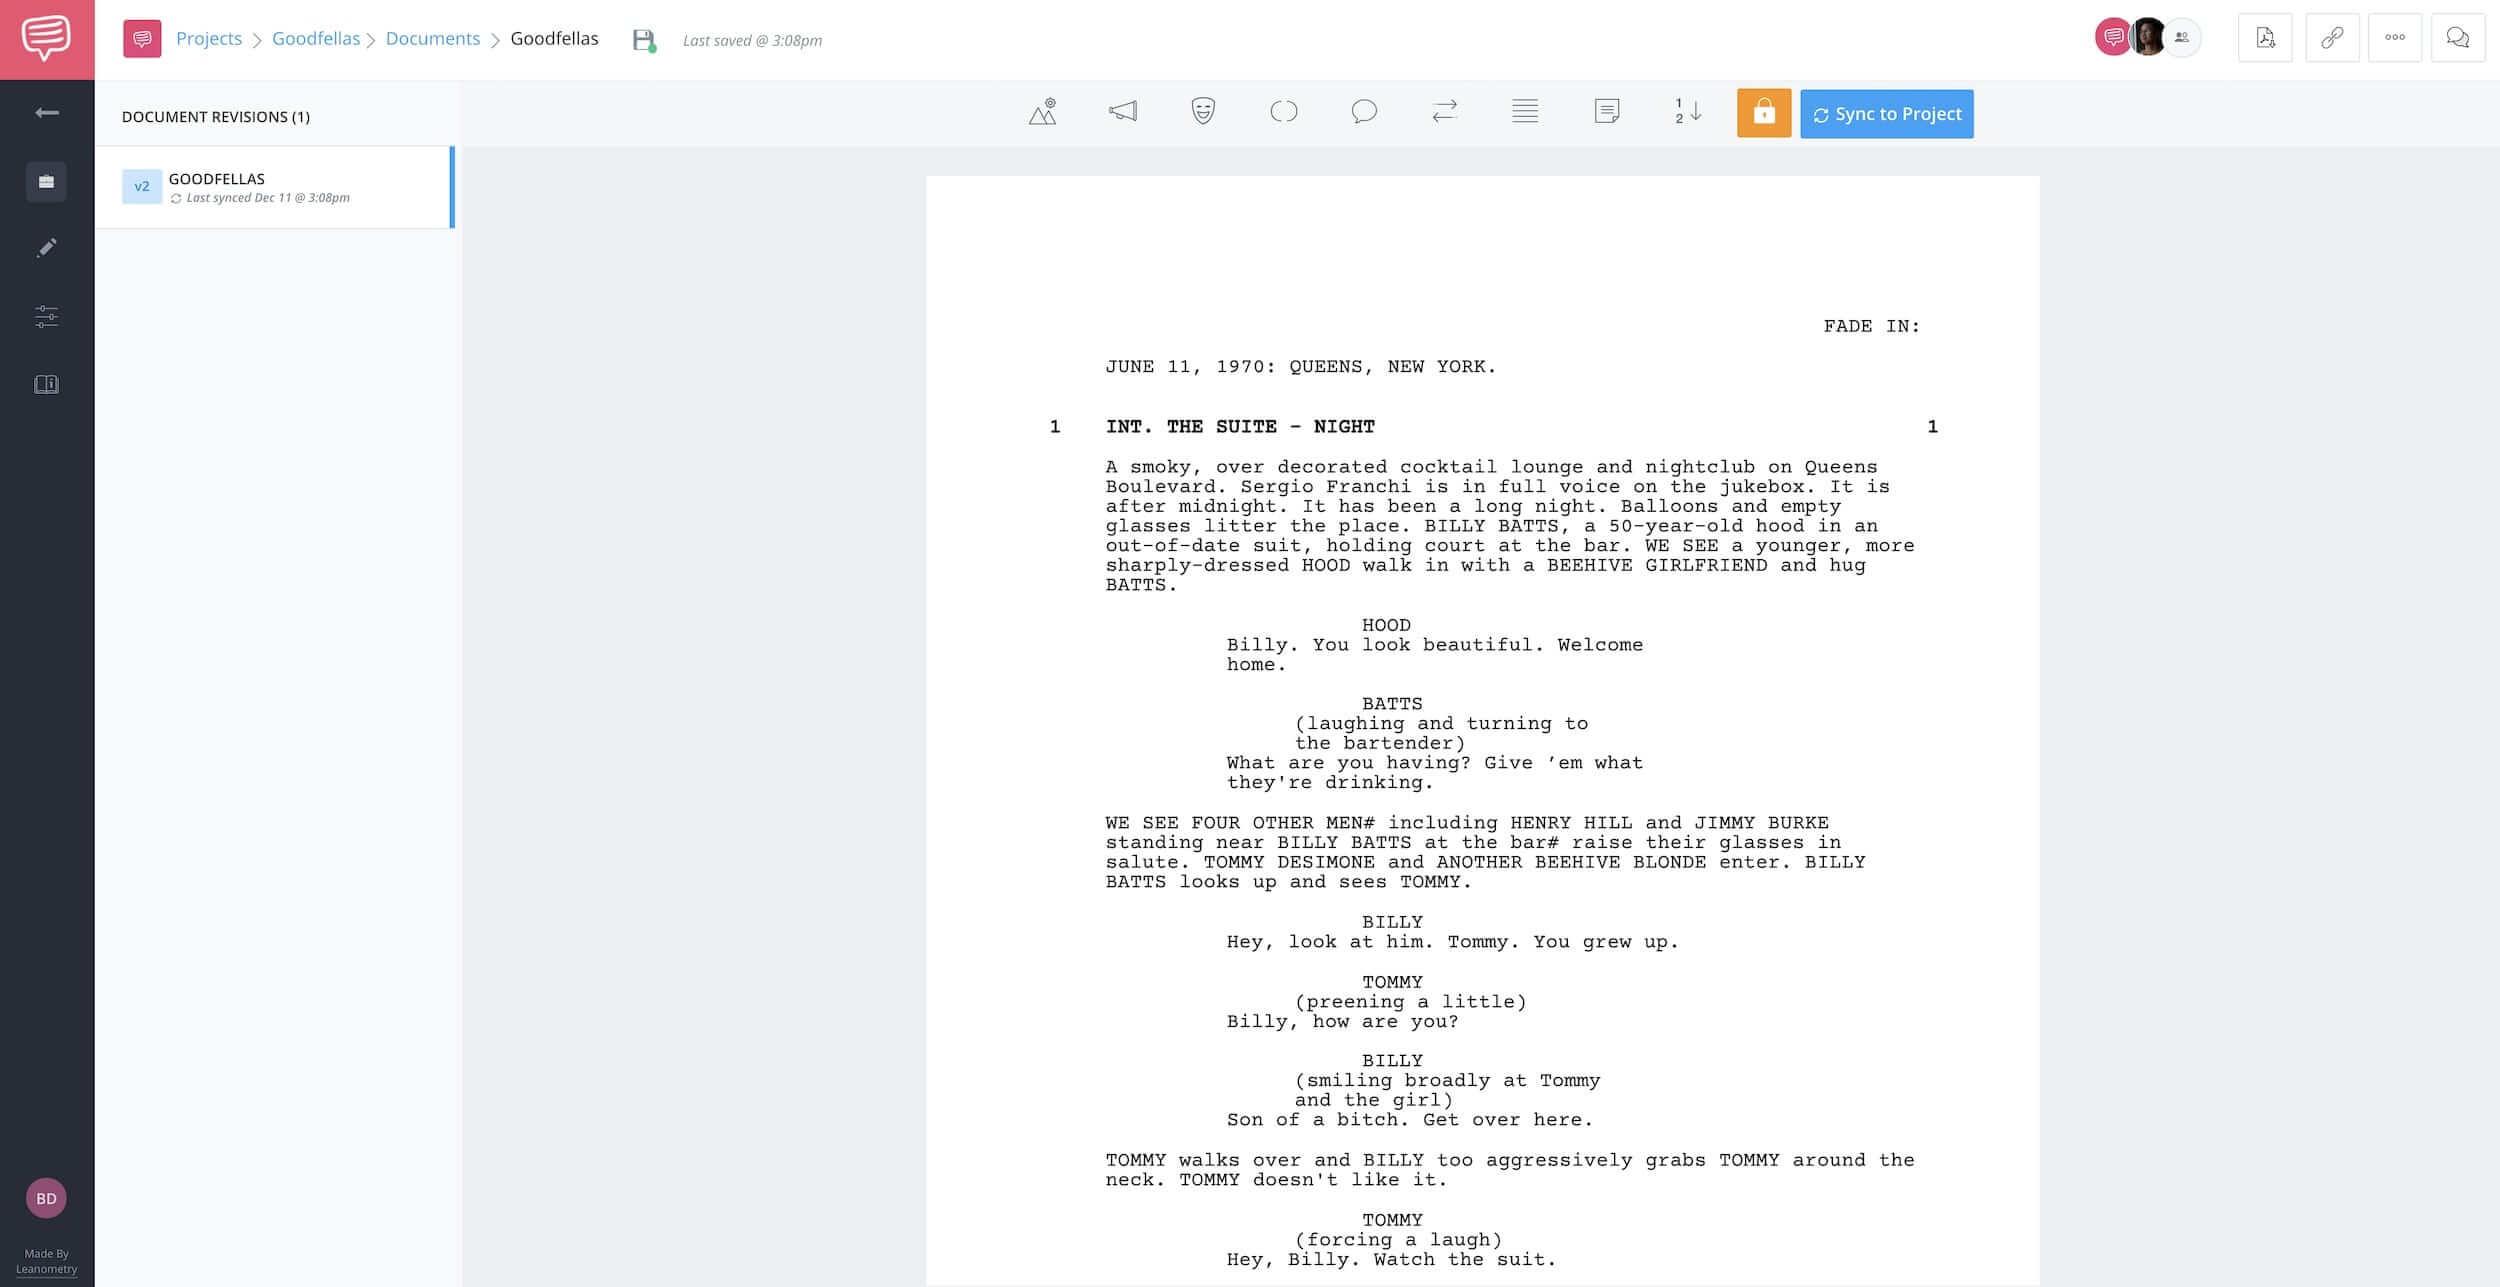 Goodfellas Script Teardown - Goodfellas Screenplay - StudioBinder - Screenwriting